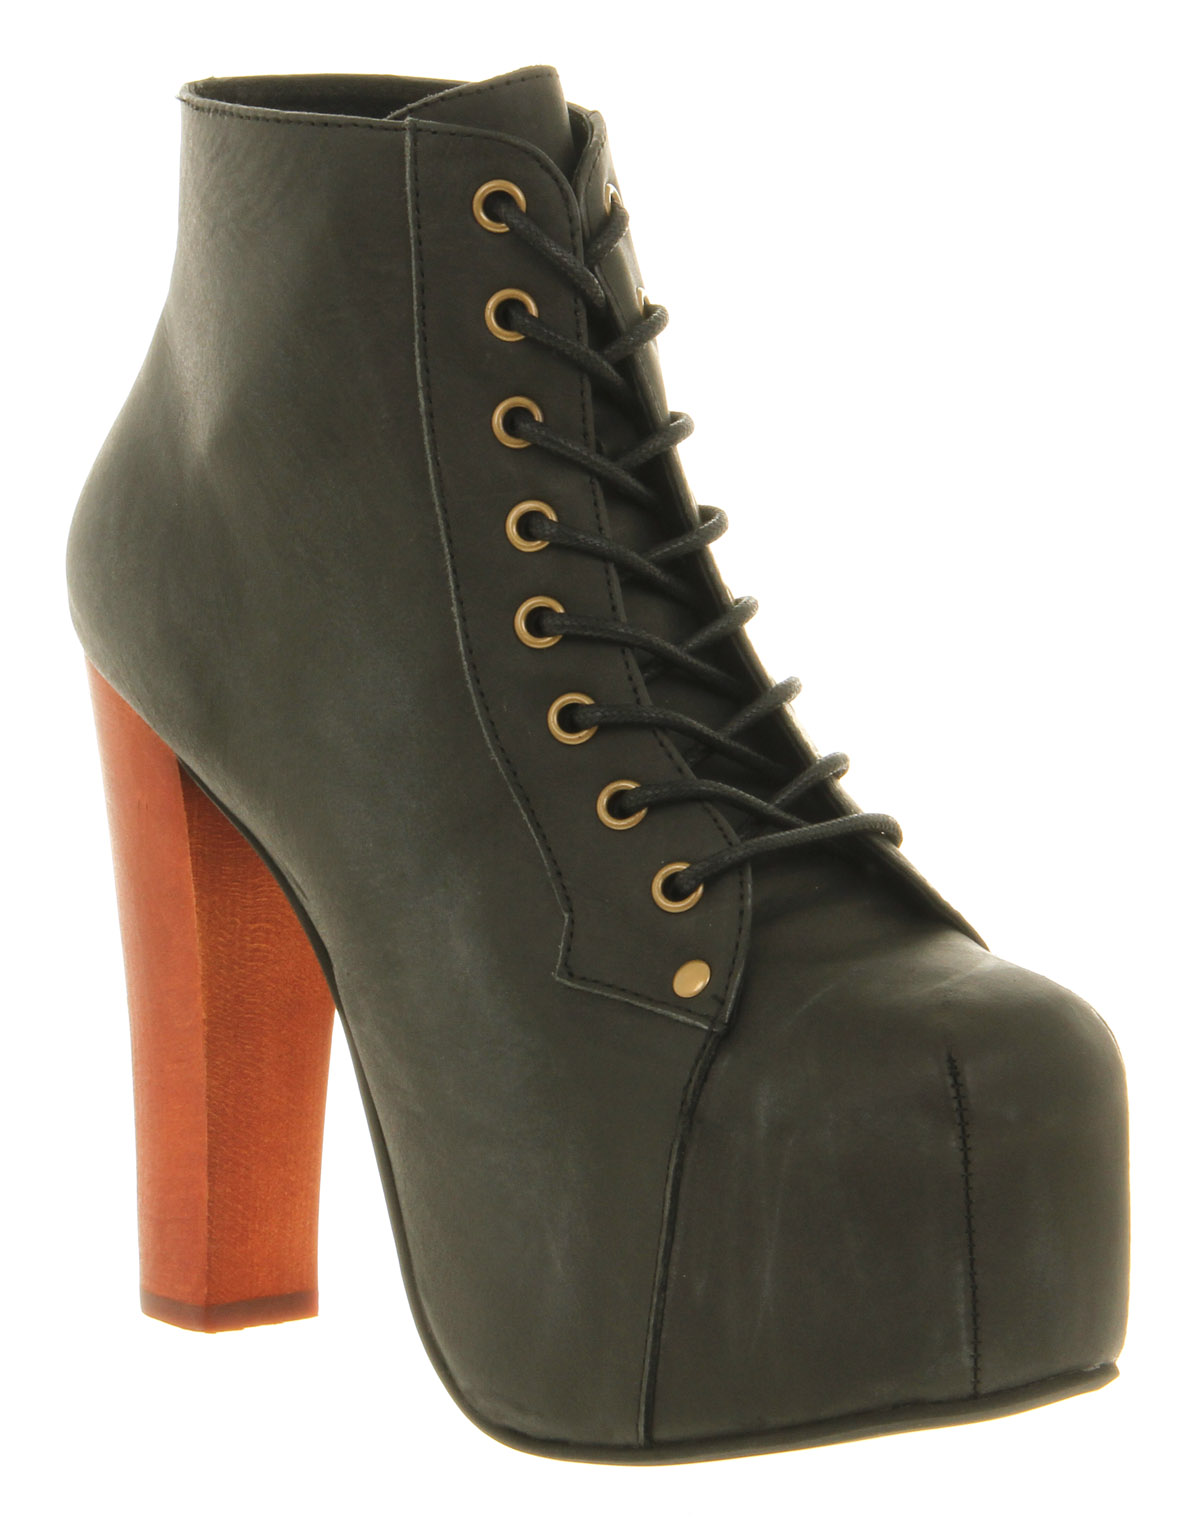 jeffrey campbell ankle boots in black lyst. Black Bedroom Furniture Sets. Home Design Ideas